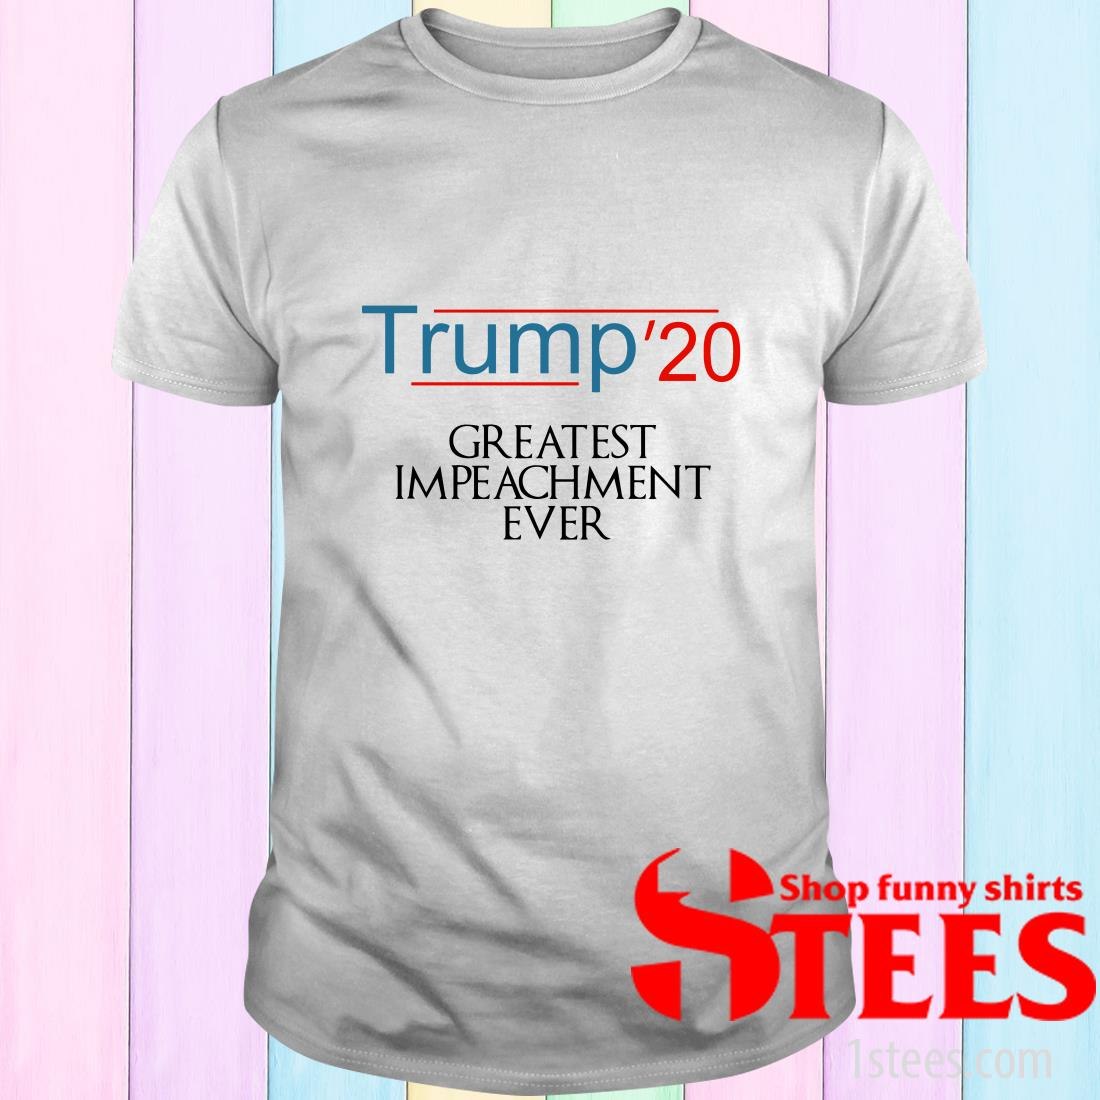 Trump'20 Greatest Greatest Impeachment Ever Shirt